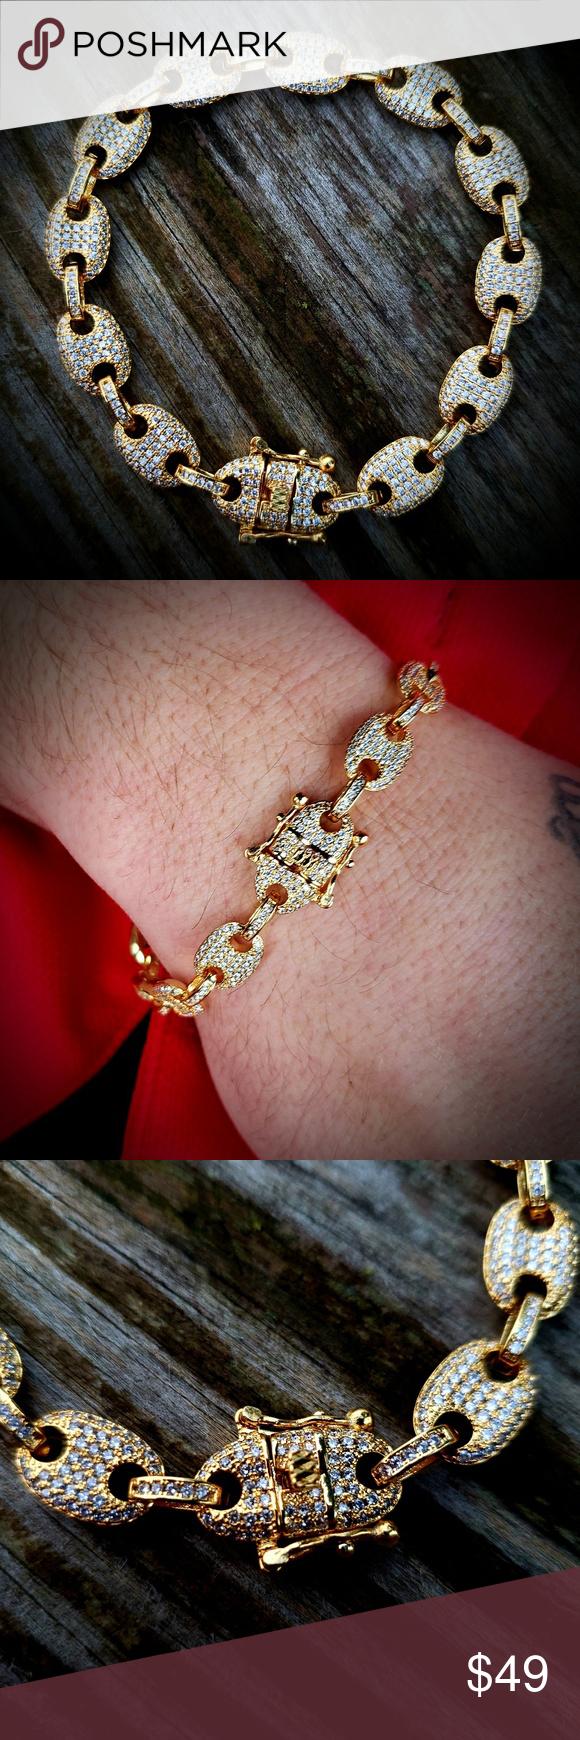 14k Gp Lab Diamond Hermes Gucci Link 8 Bracelet Lab Diamonds Bracelets Link Bracelets